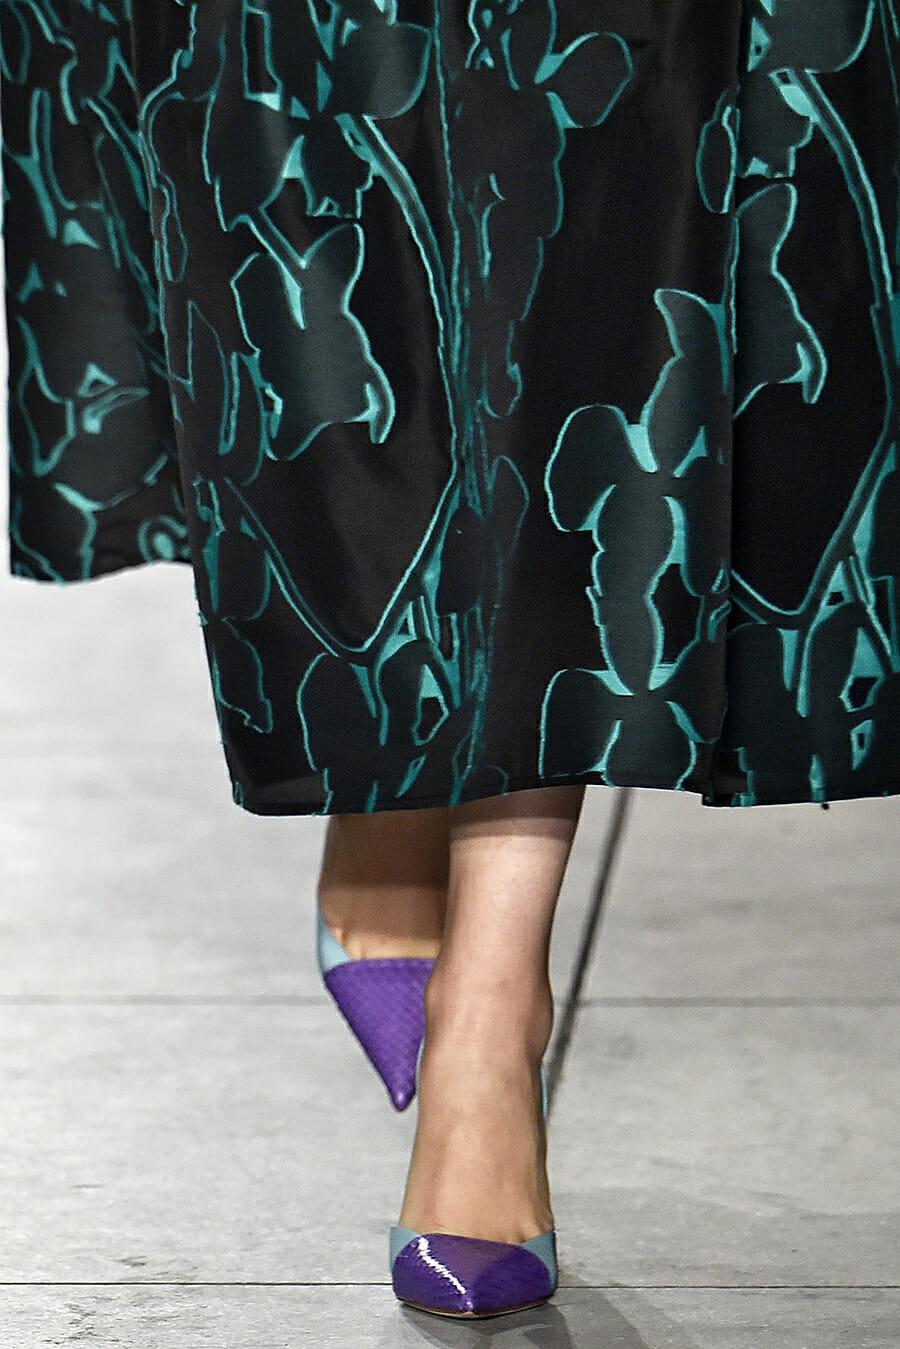 Carolina-Herrera-New-York-Fashion-Week-Spring-Summer-2018-NY-September-2017-look22-detail4